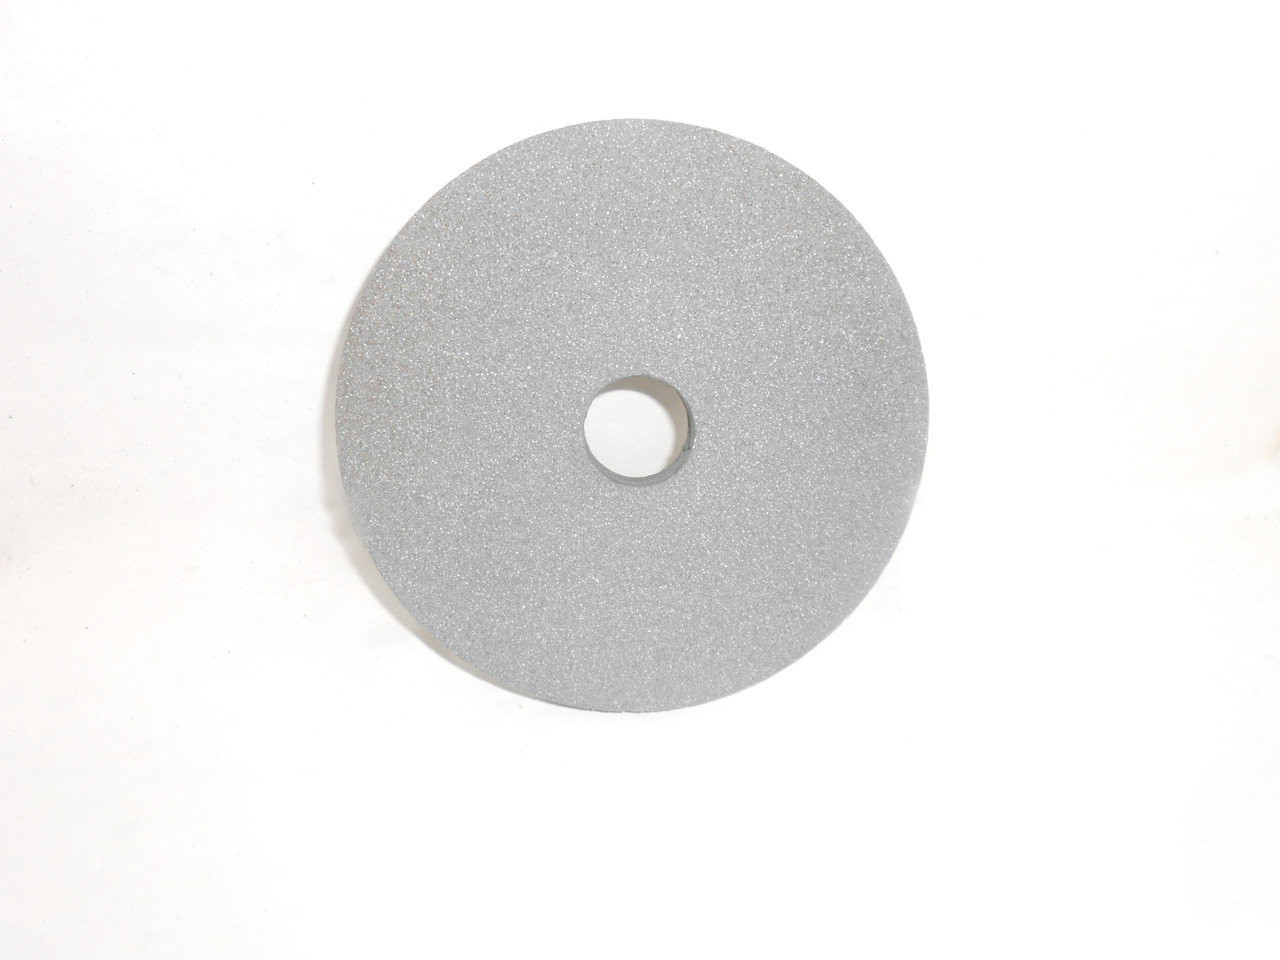 Круг шлифовальный 14А ПП 100х25х20  40 СМ